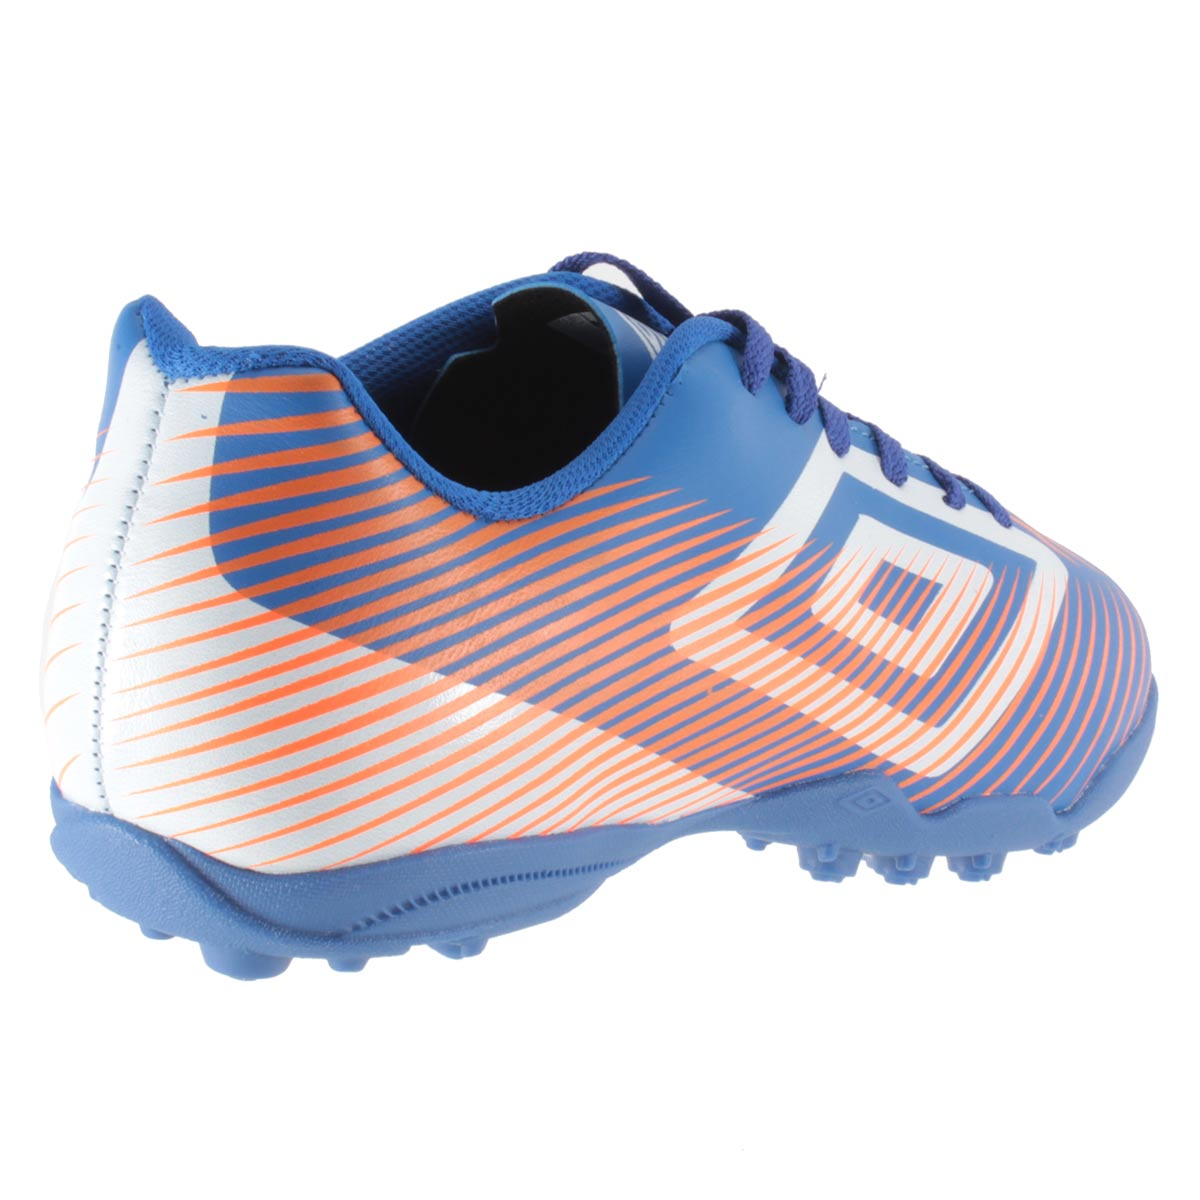 Chuteira Umbro Speed 2 Futebol Society 0F71041